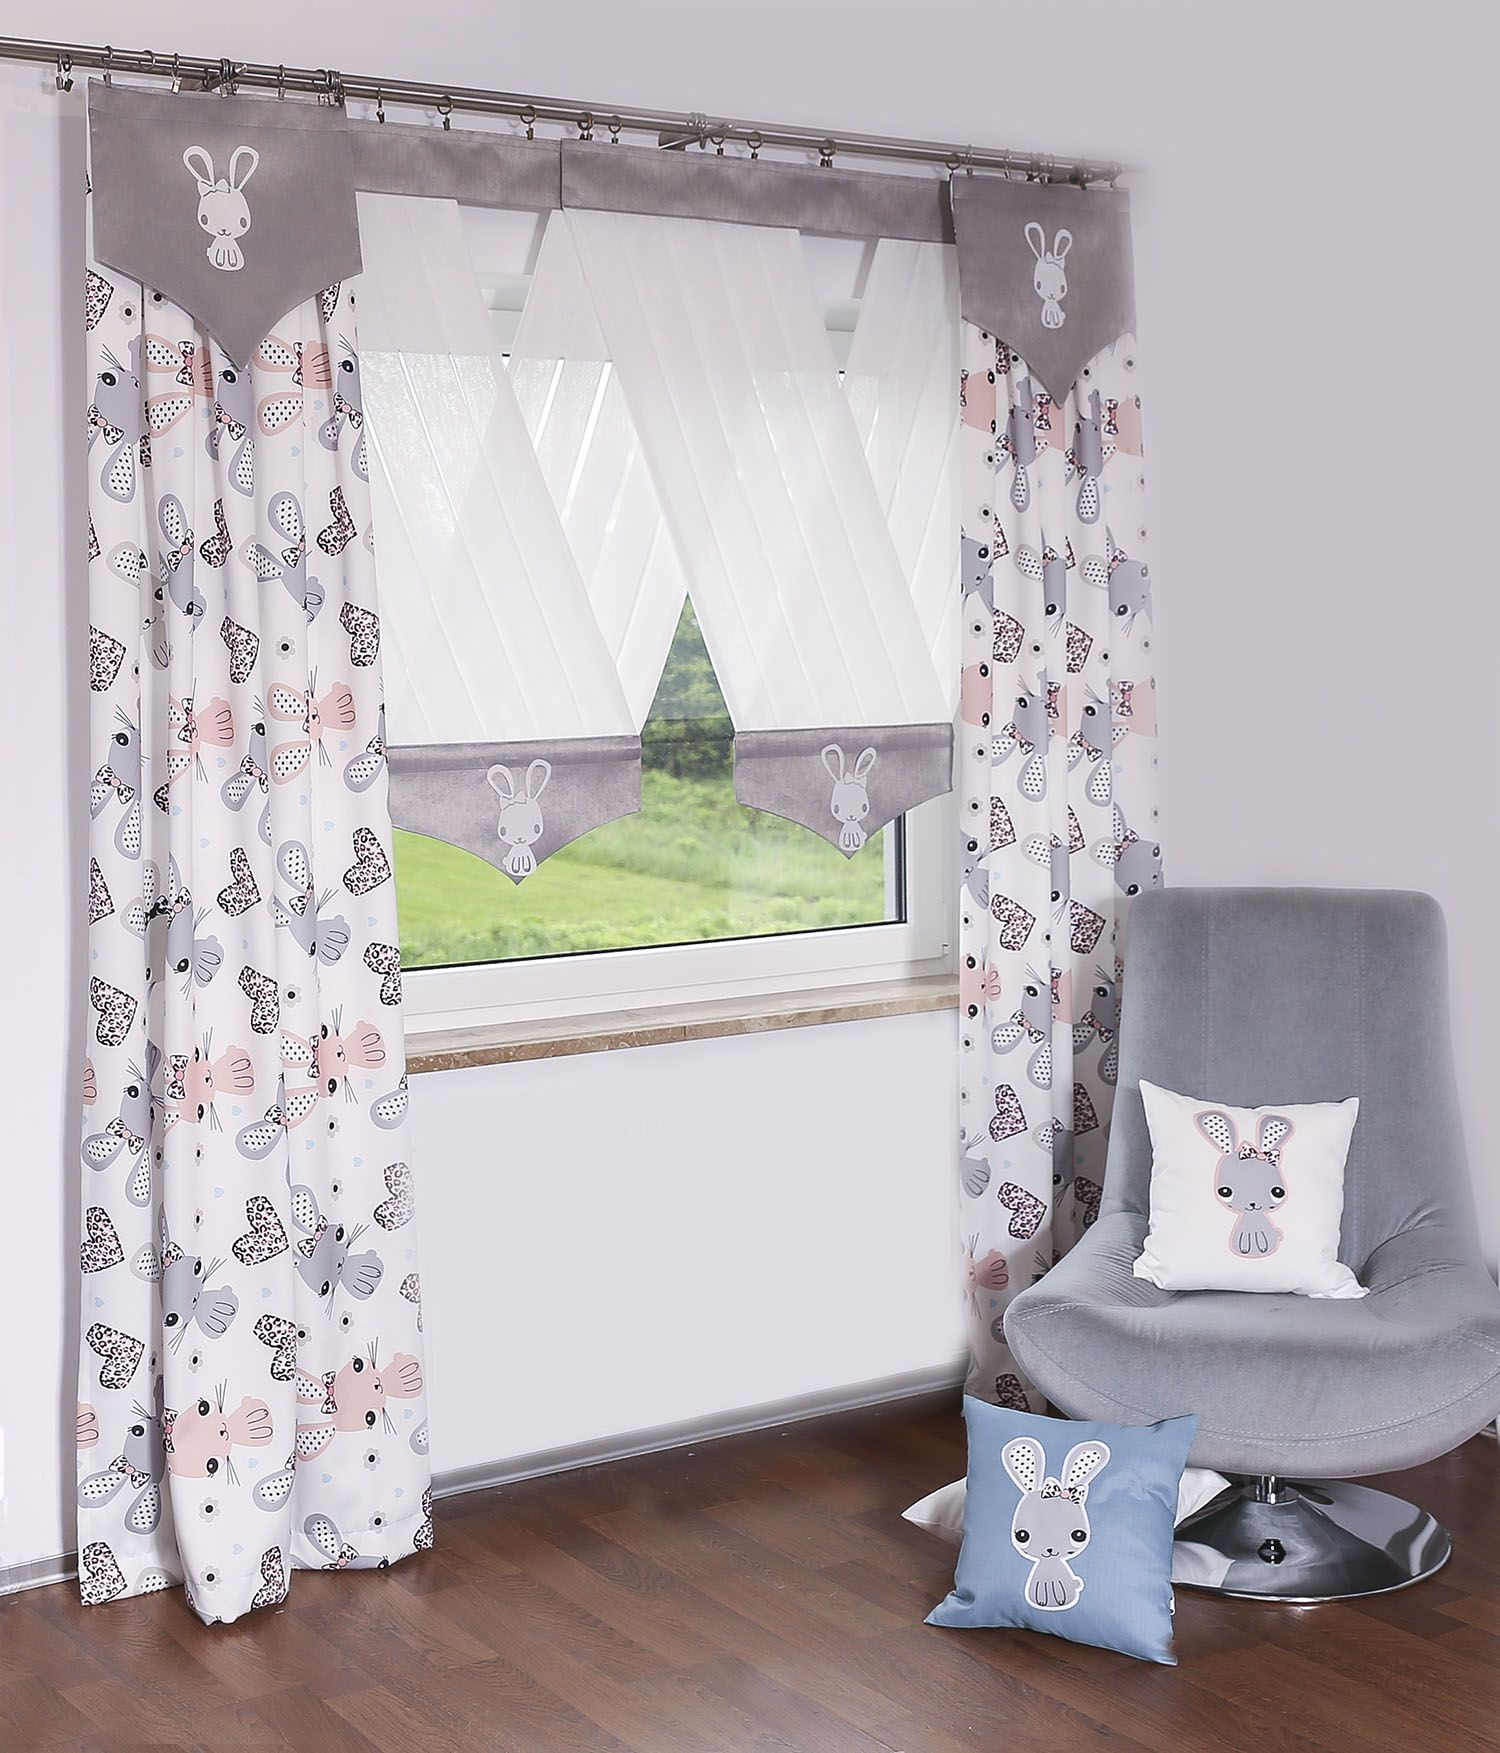 Firana V Ka W Kroliki W Pokoju Dziecka Window Decor Home Decor Home